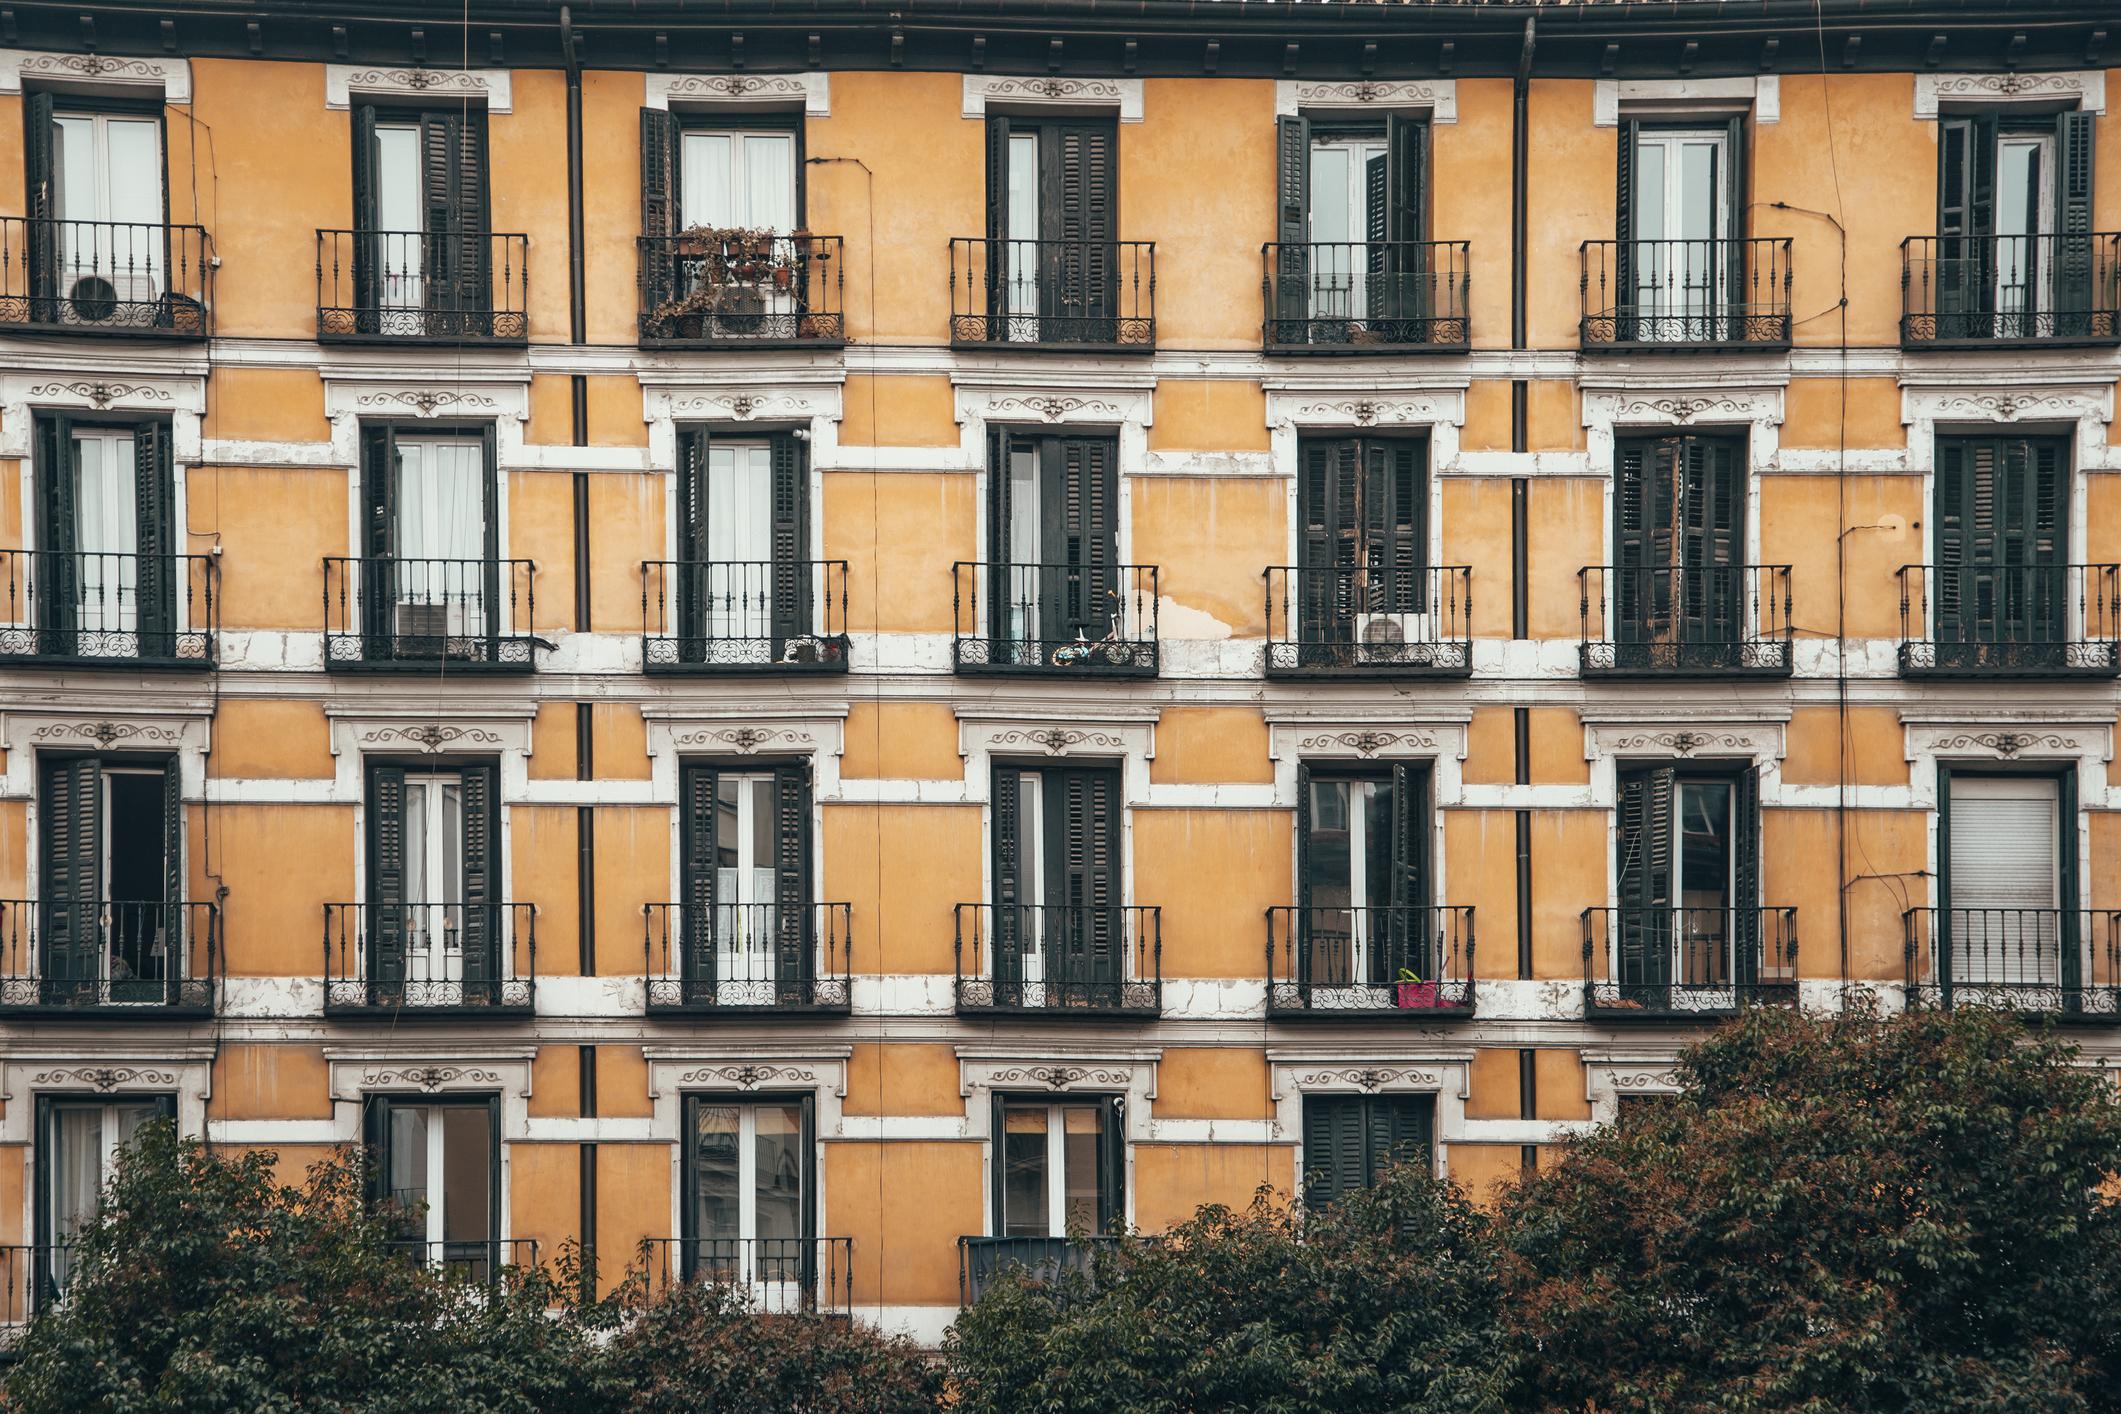 Alquiler habitaciones en arapiles madrid pisos para estudiantes - Pisos estudiantes madrid baratos ...